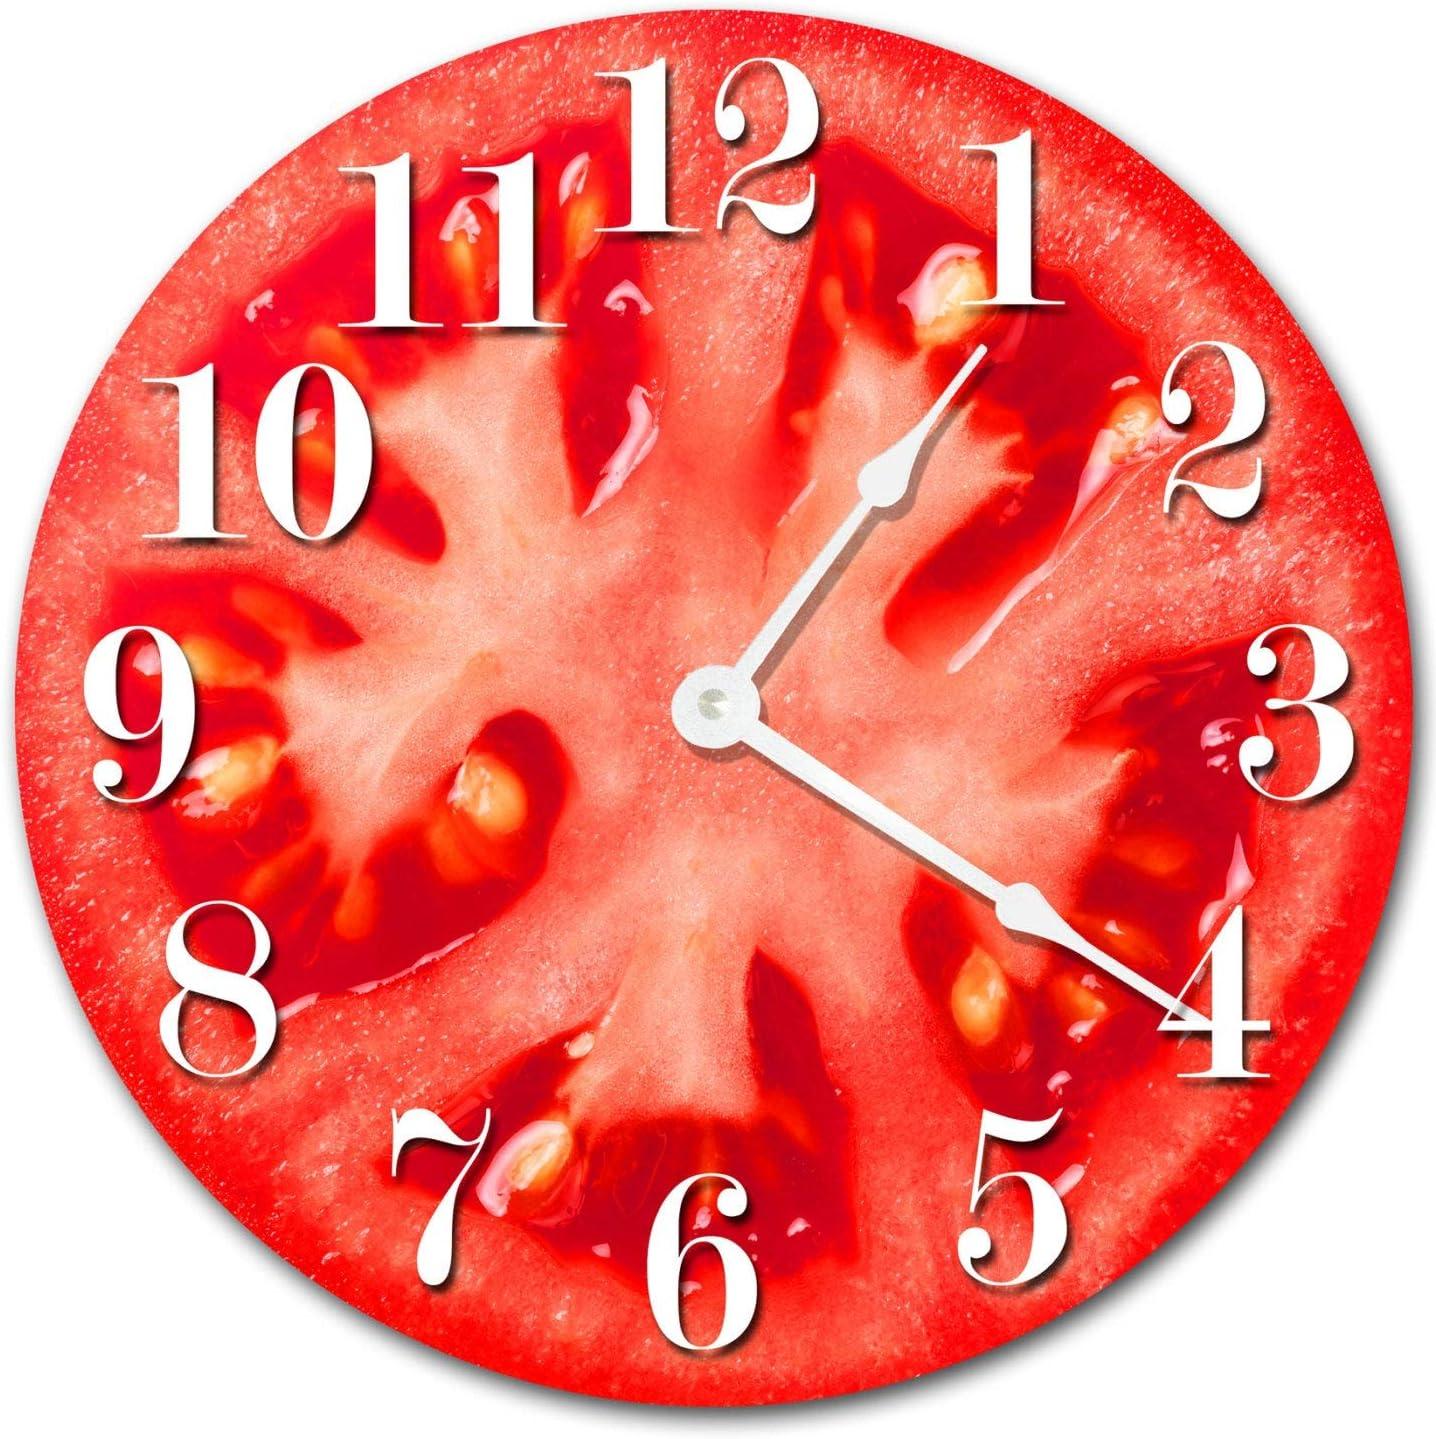 8Jo6Poe Tomato Clock Large 12 inch Clock Novelty Clocks Wall Clocks Round Clock, Food Clock, Kitchen Clock, red Vegetables Clock 2017